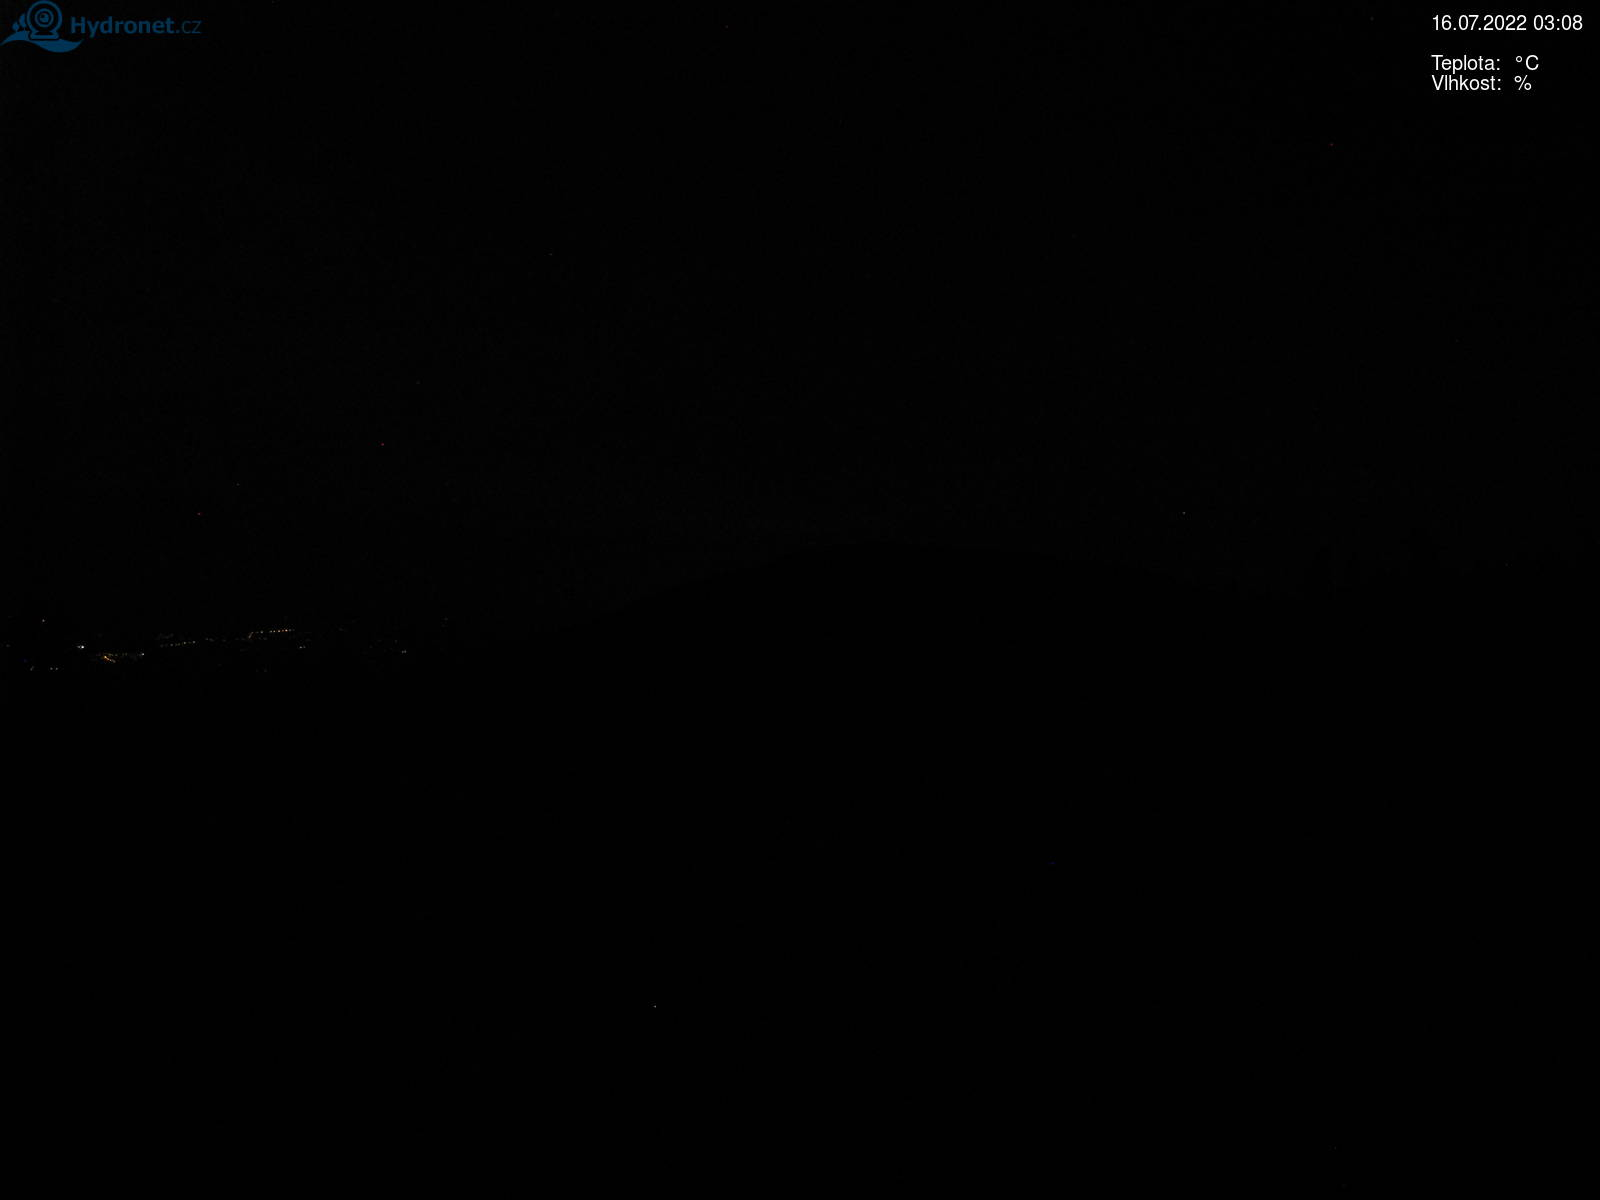 Webcam Ski Resort Spindleruv Mlyn Kotel - Giant Mountains